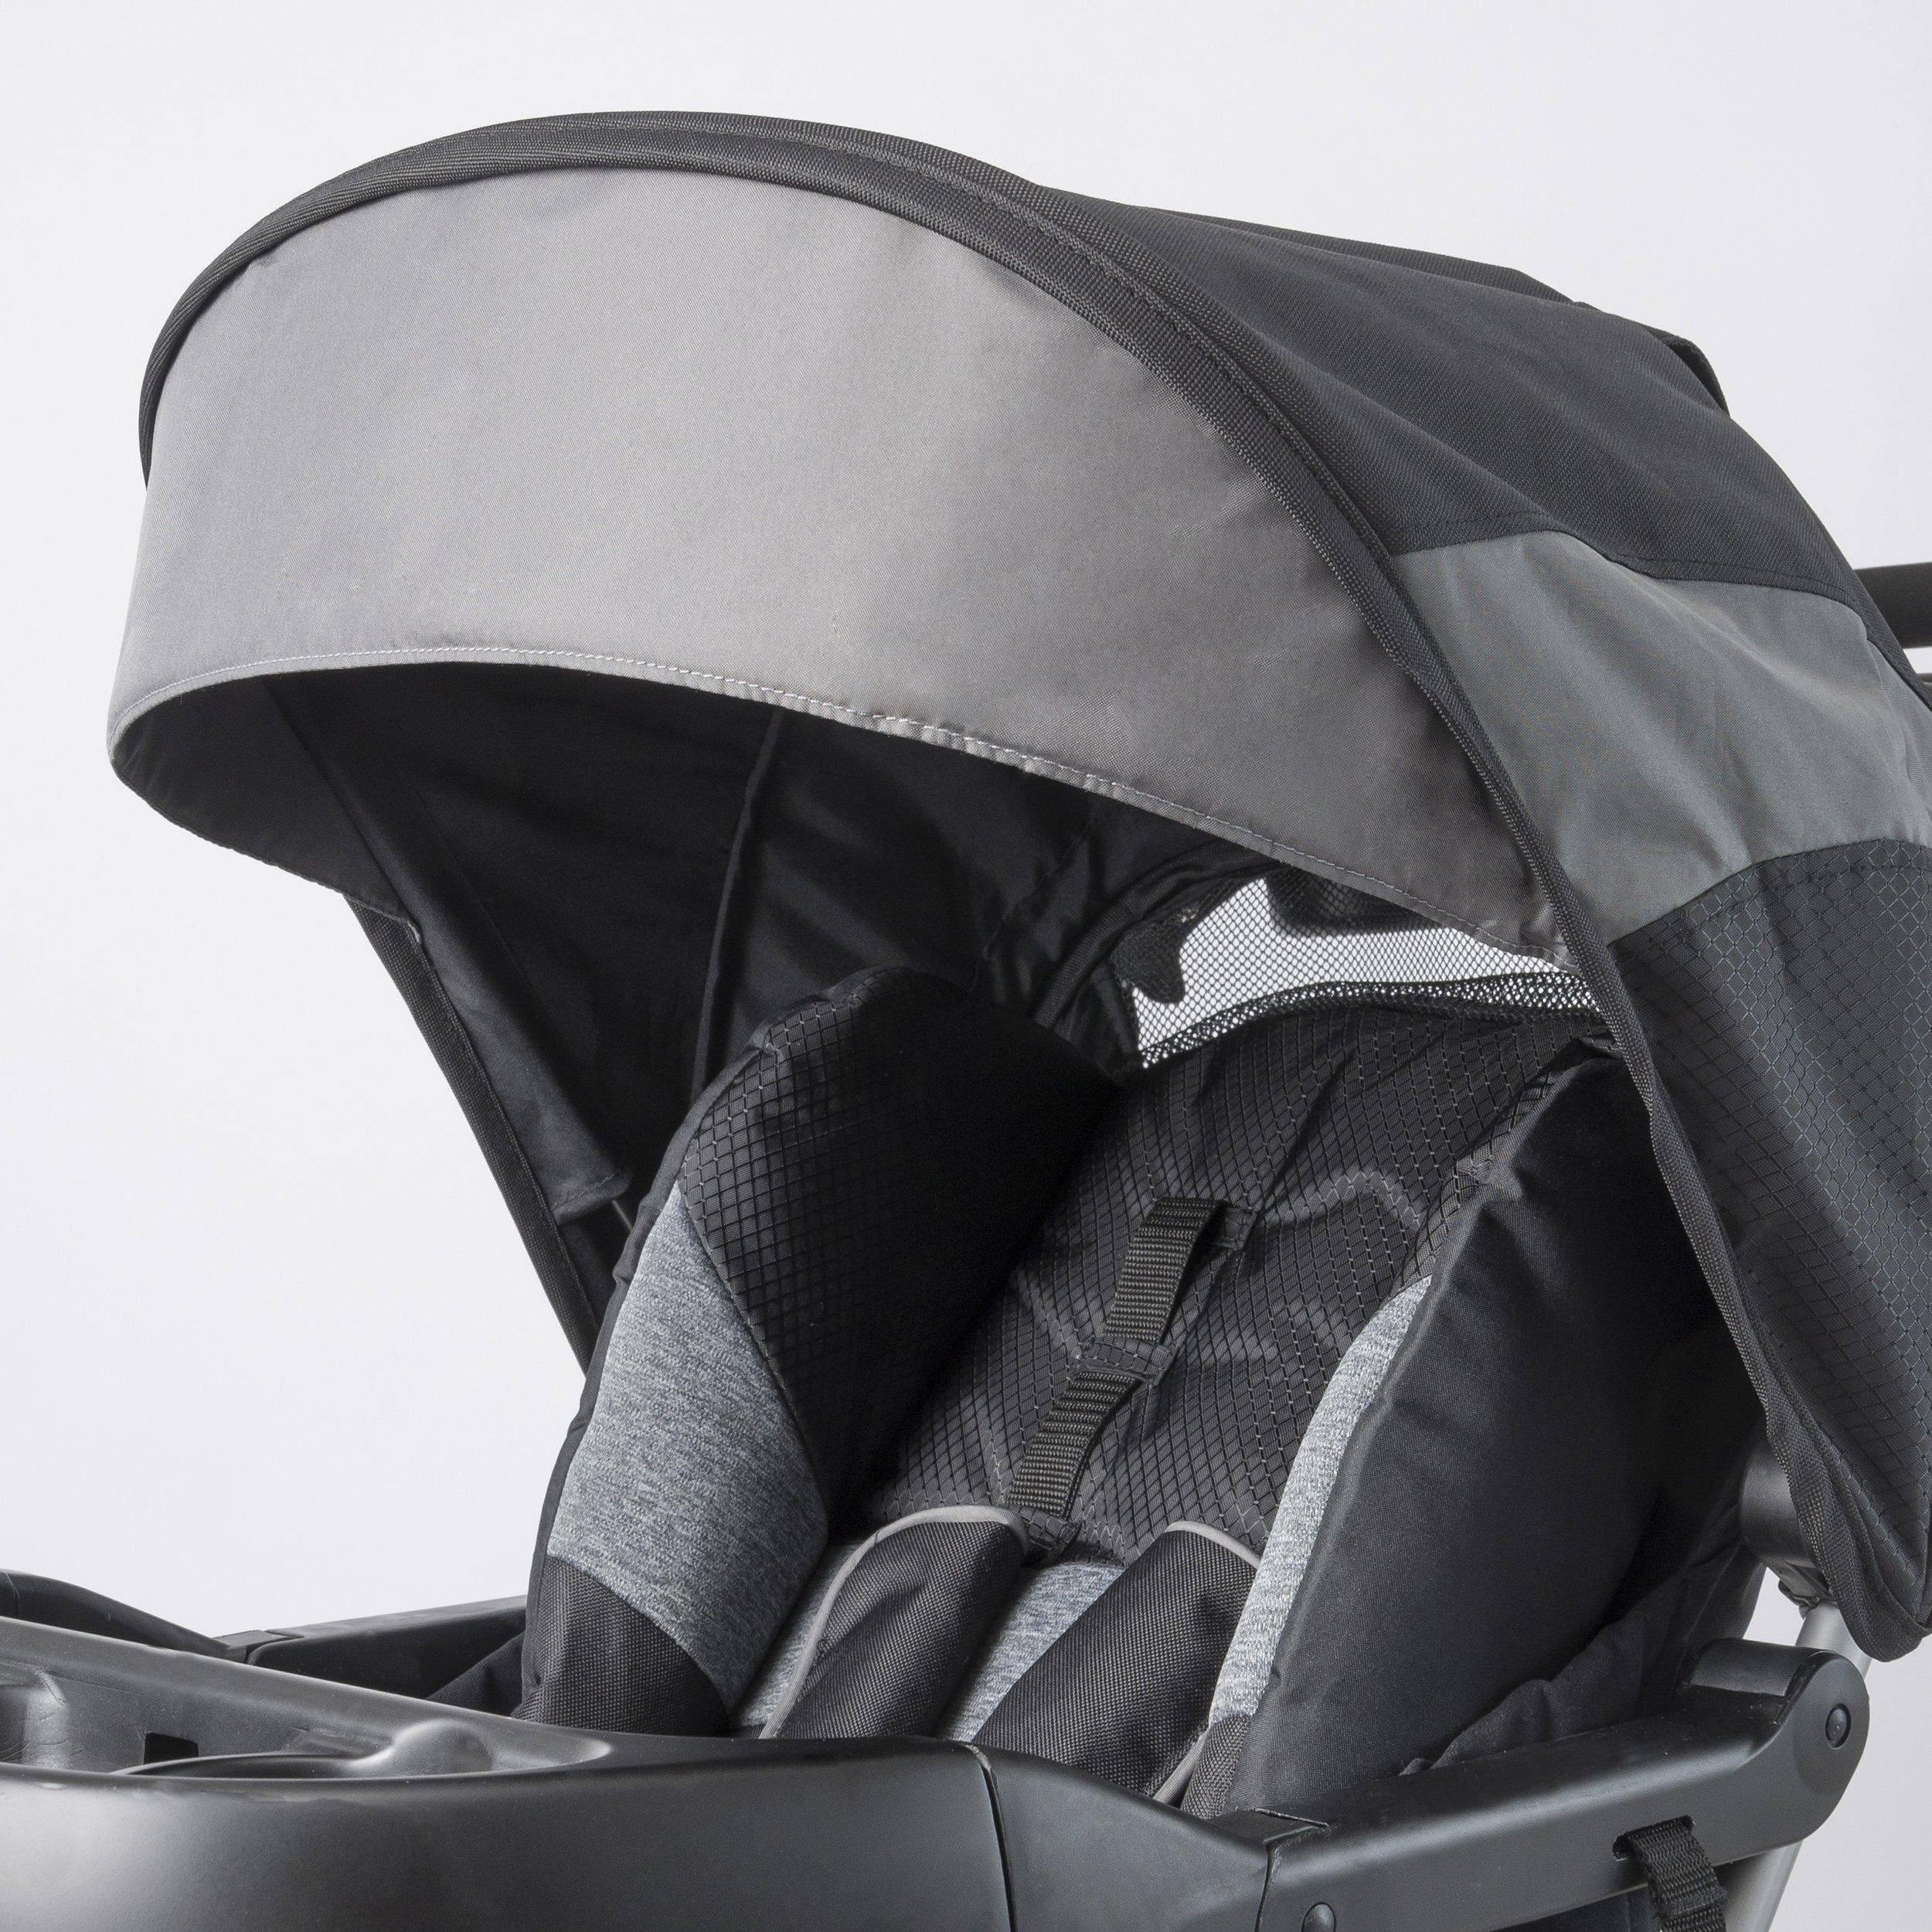 Evenflo Advanced SensorSafe Epic Travel System with LiteMax Infant Car Seat, Jet by Evenflo (Image #8)